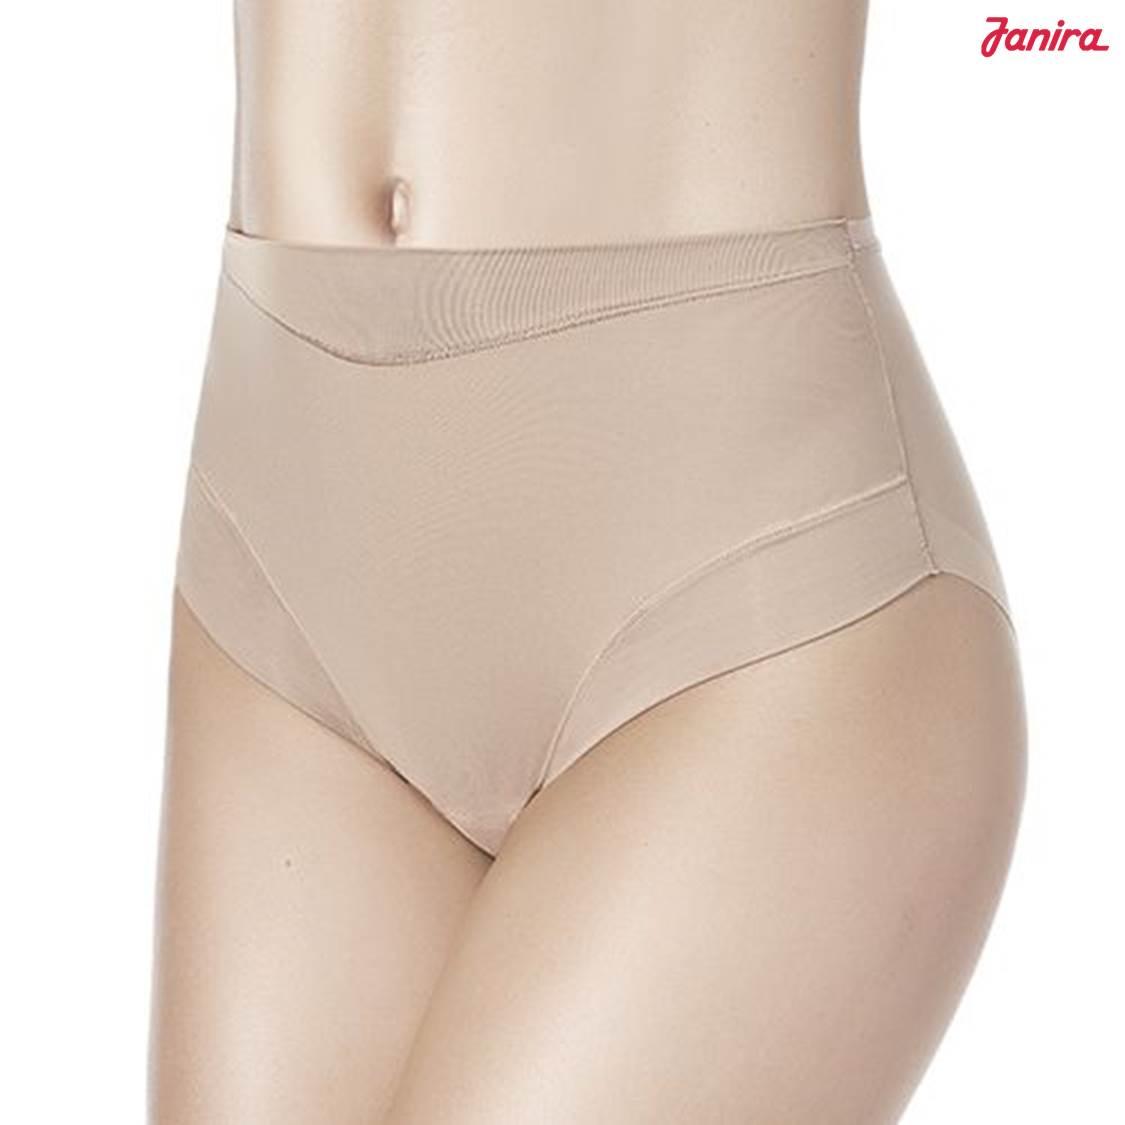 Braguita Slip Best Comfort Janira